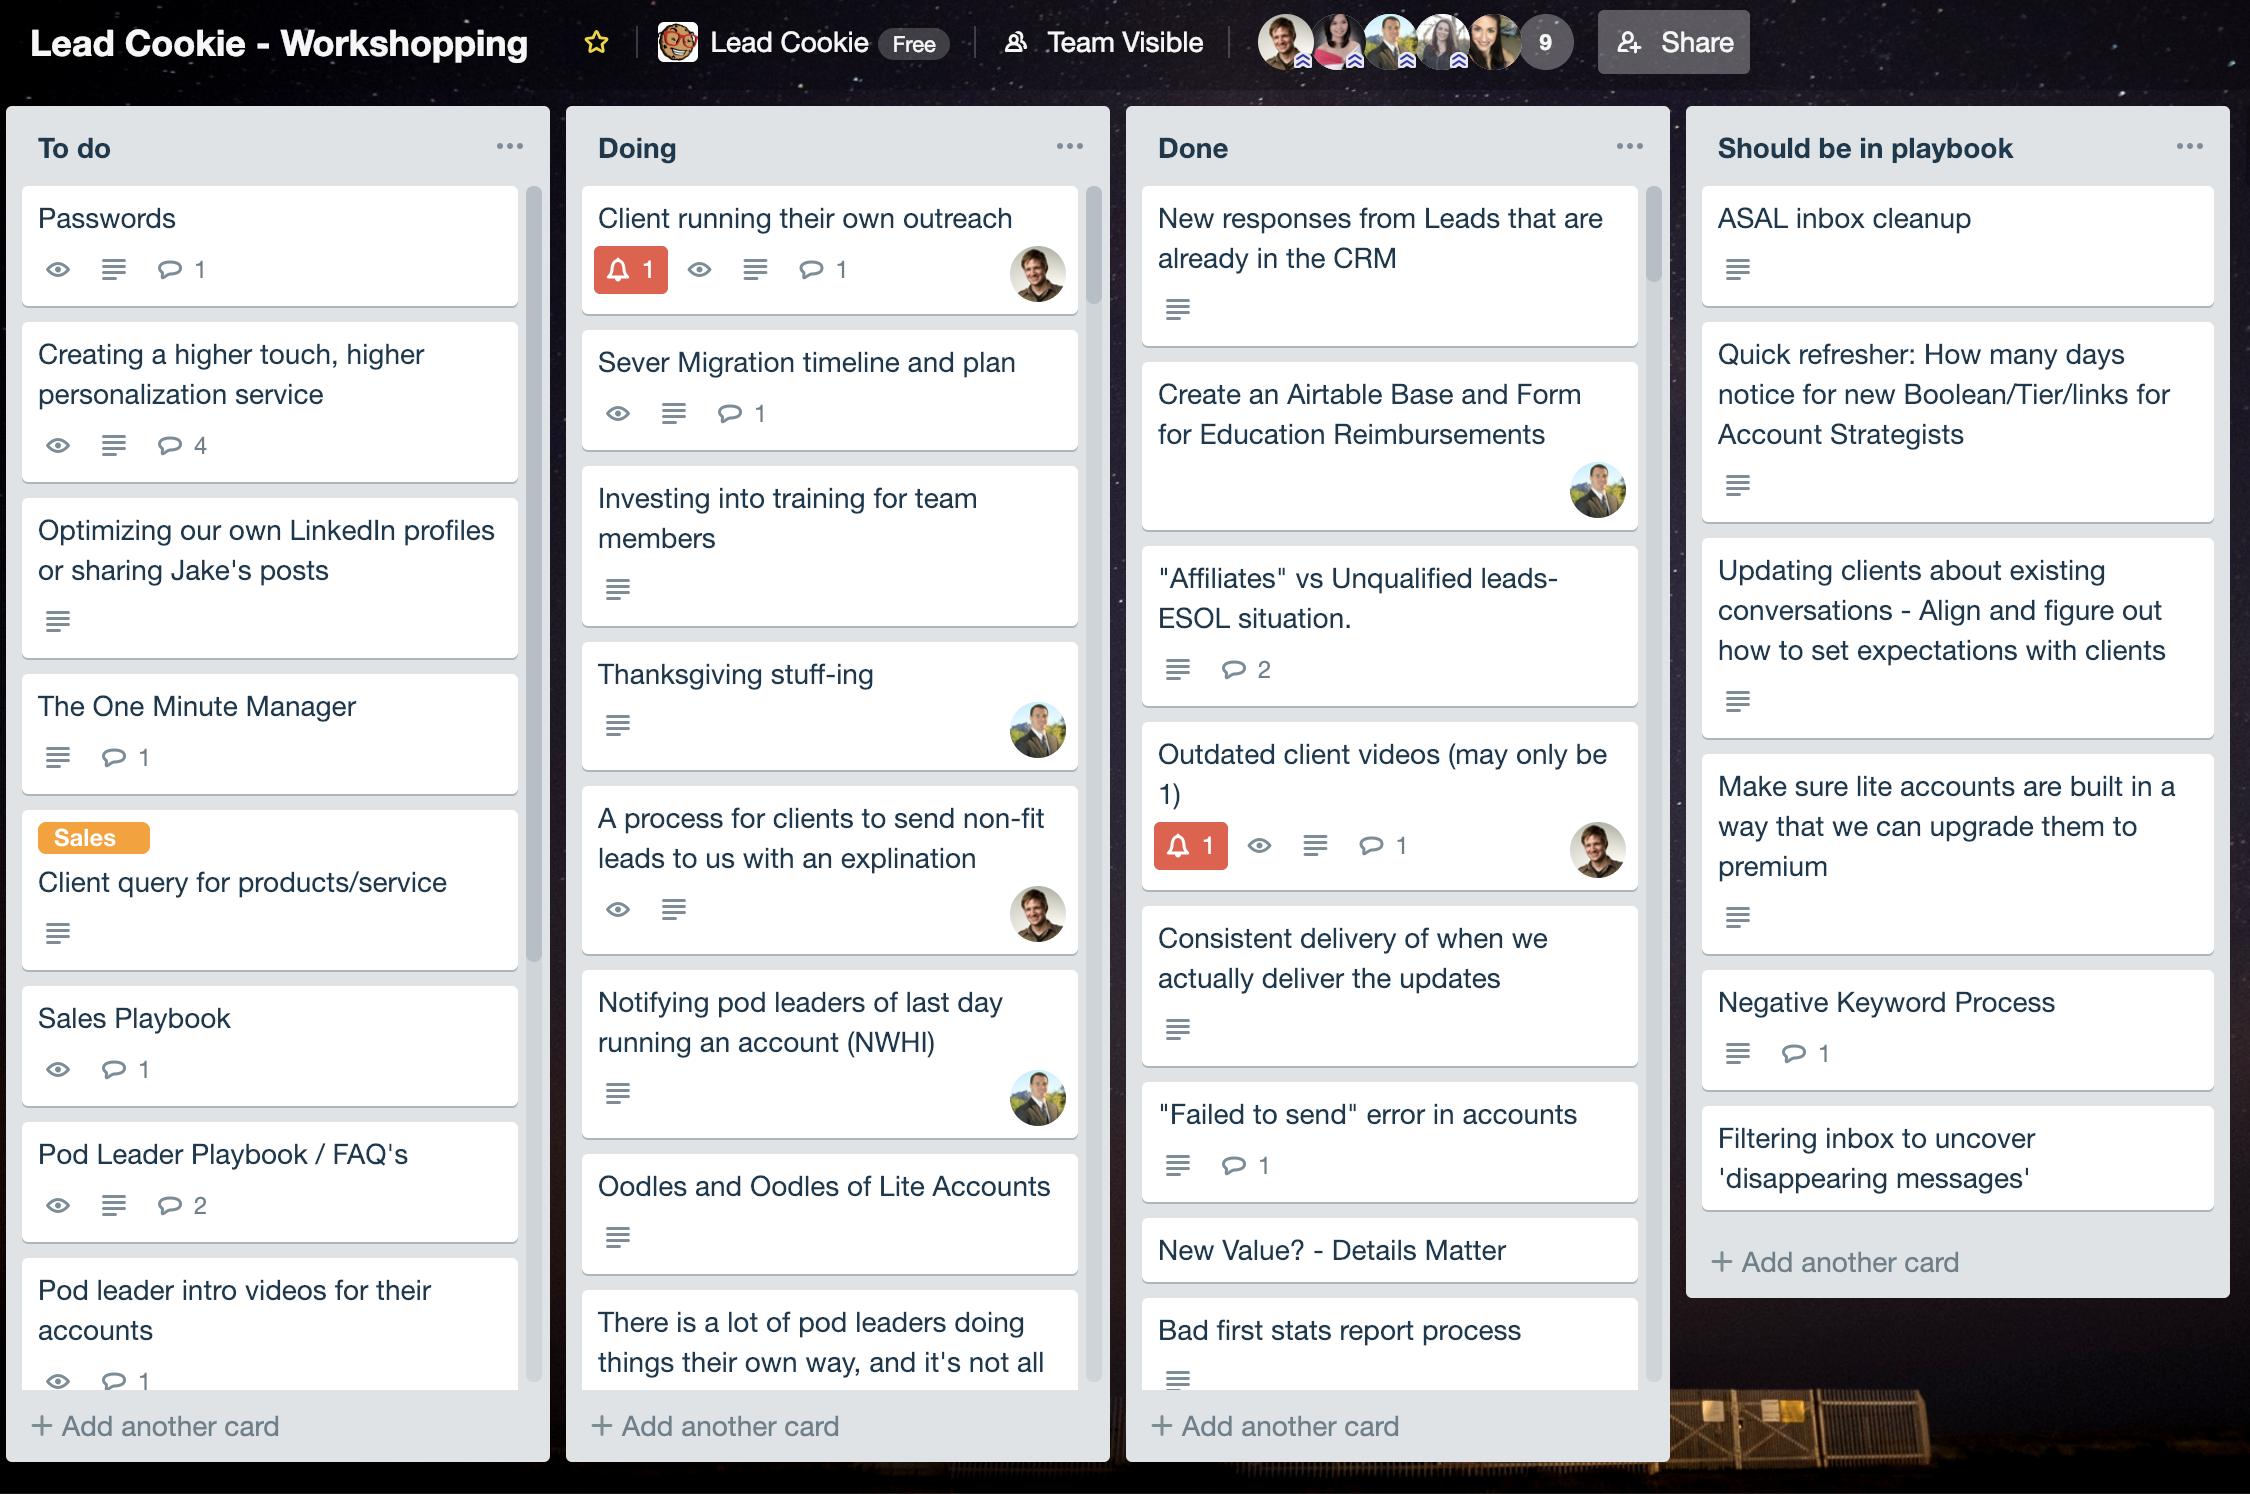 Screenshot 2019-02-08 14.35.36.png